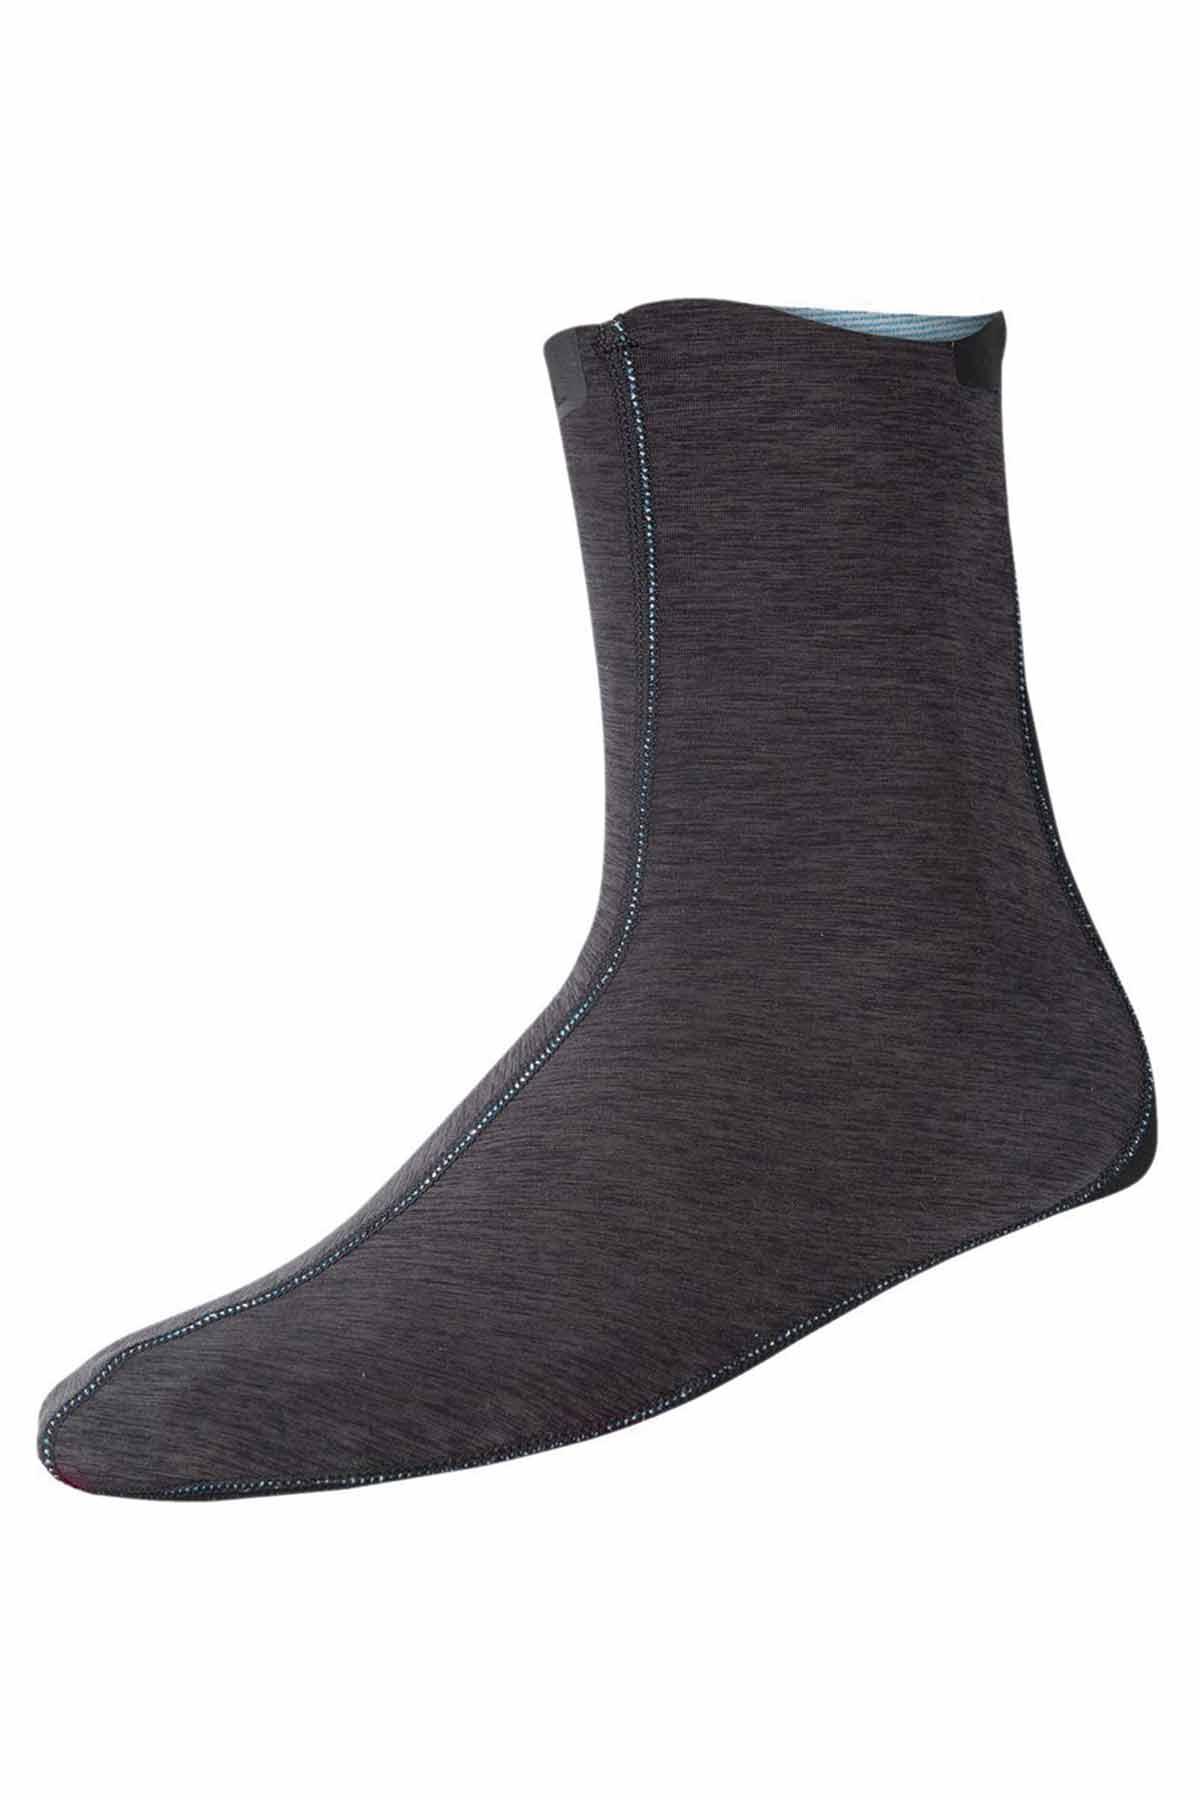 NRS Hydroskin .5 mm Sock